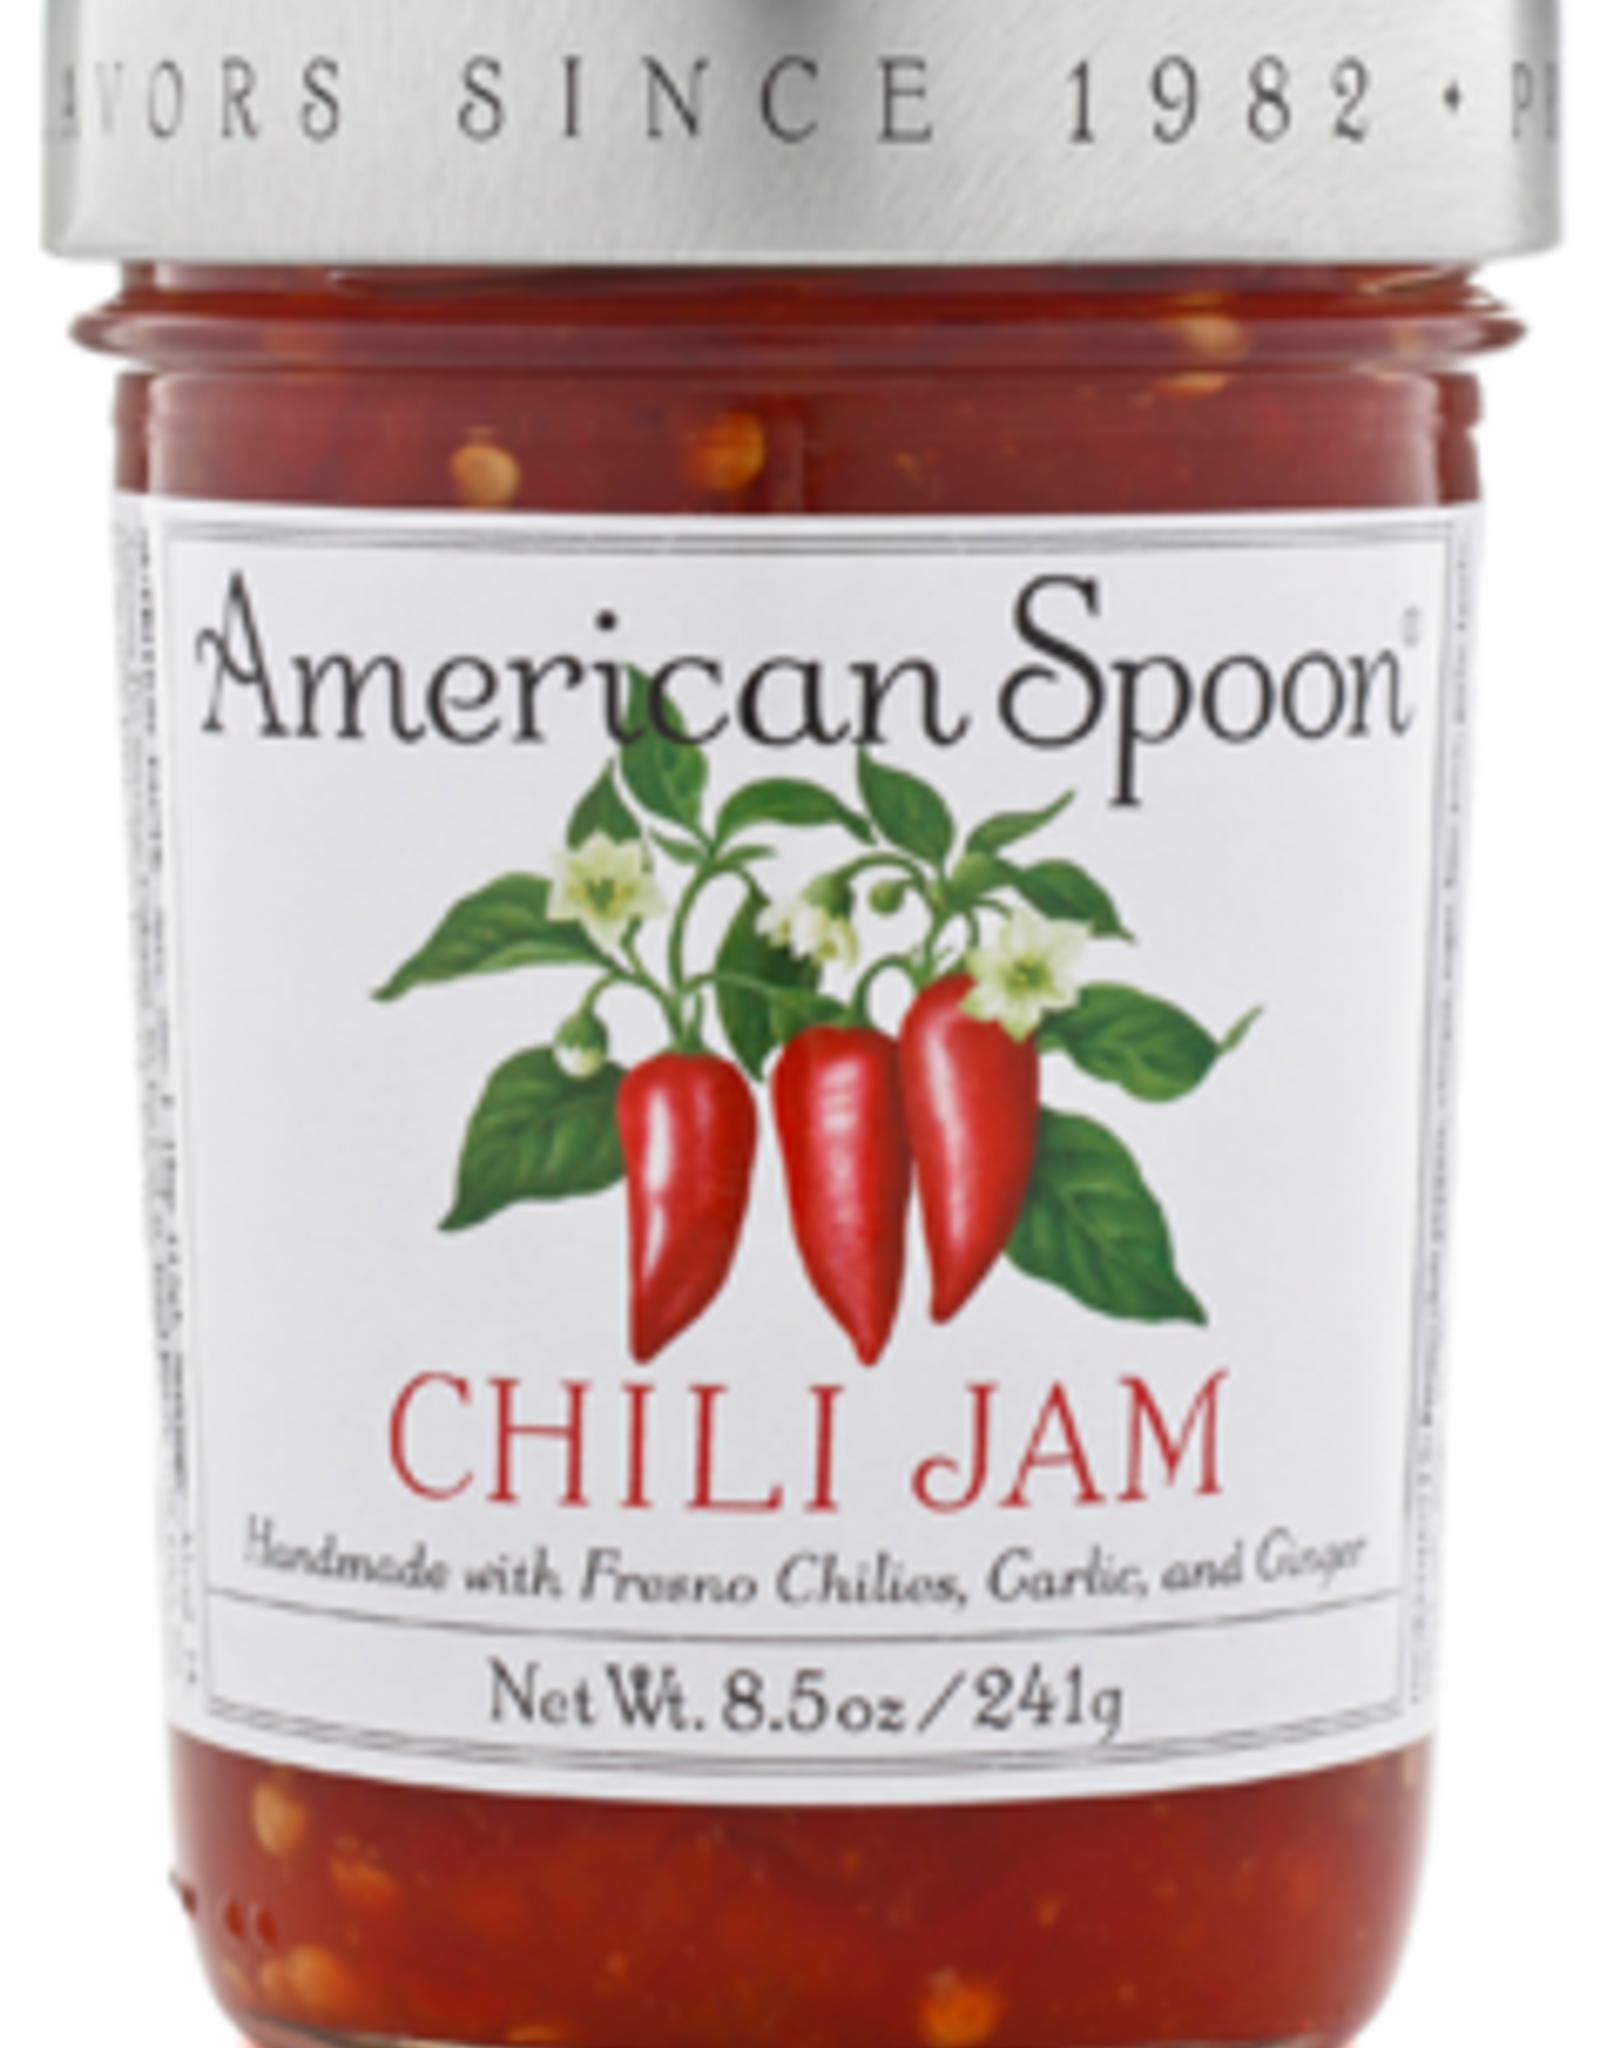 American Spoon AMERICAN SPOON CHILI JAM